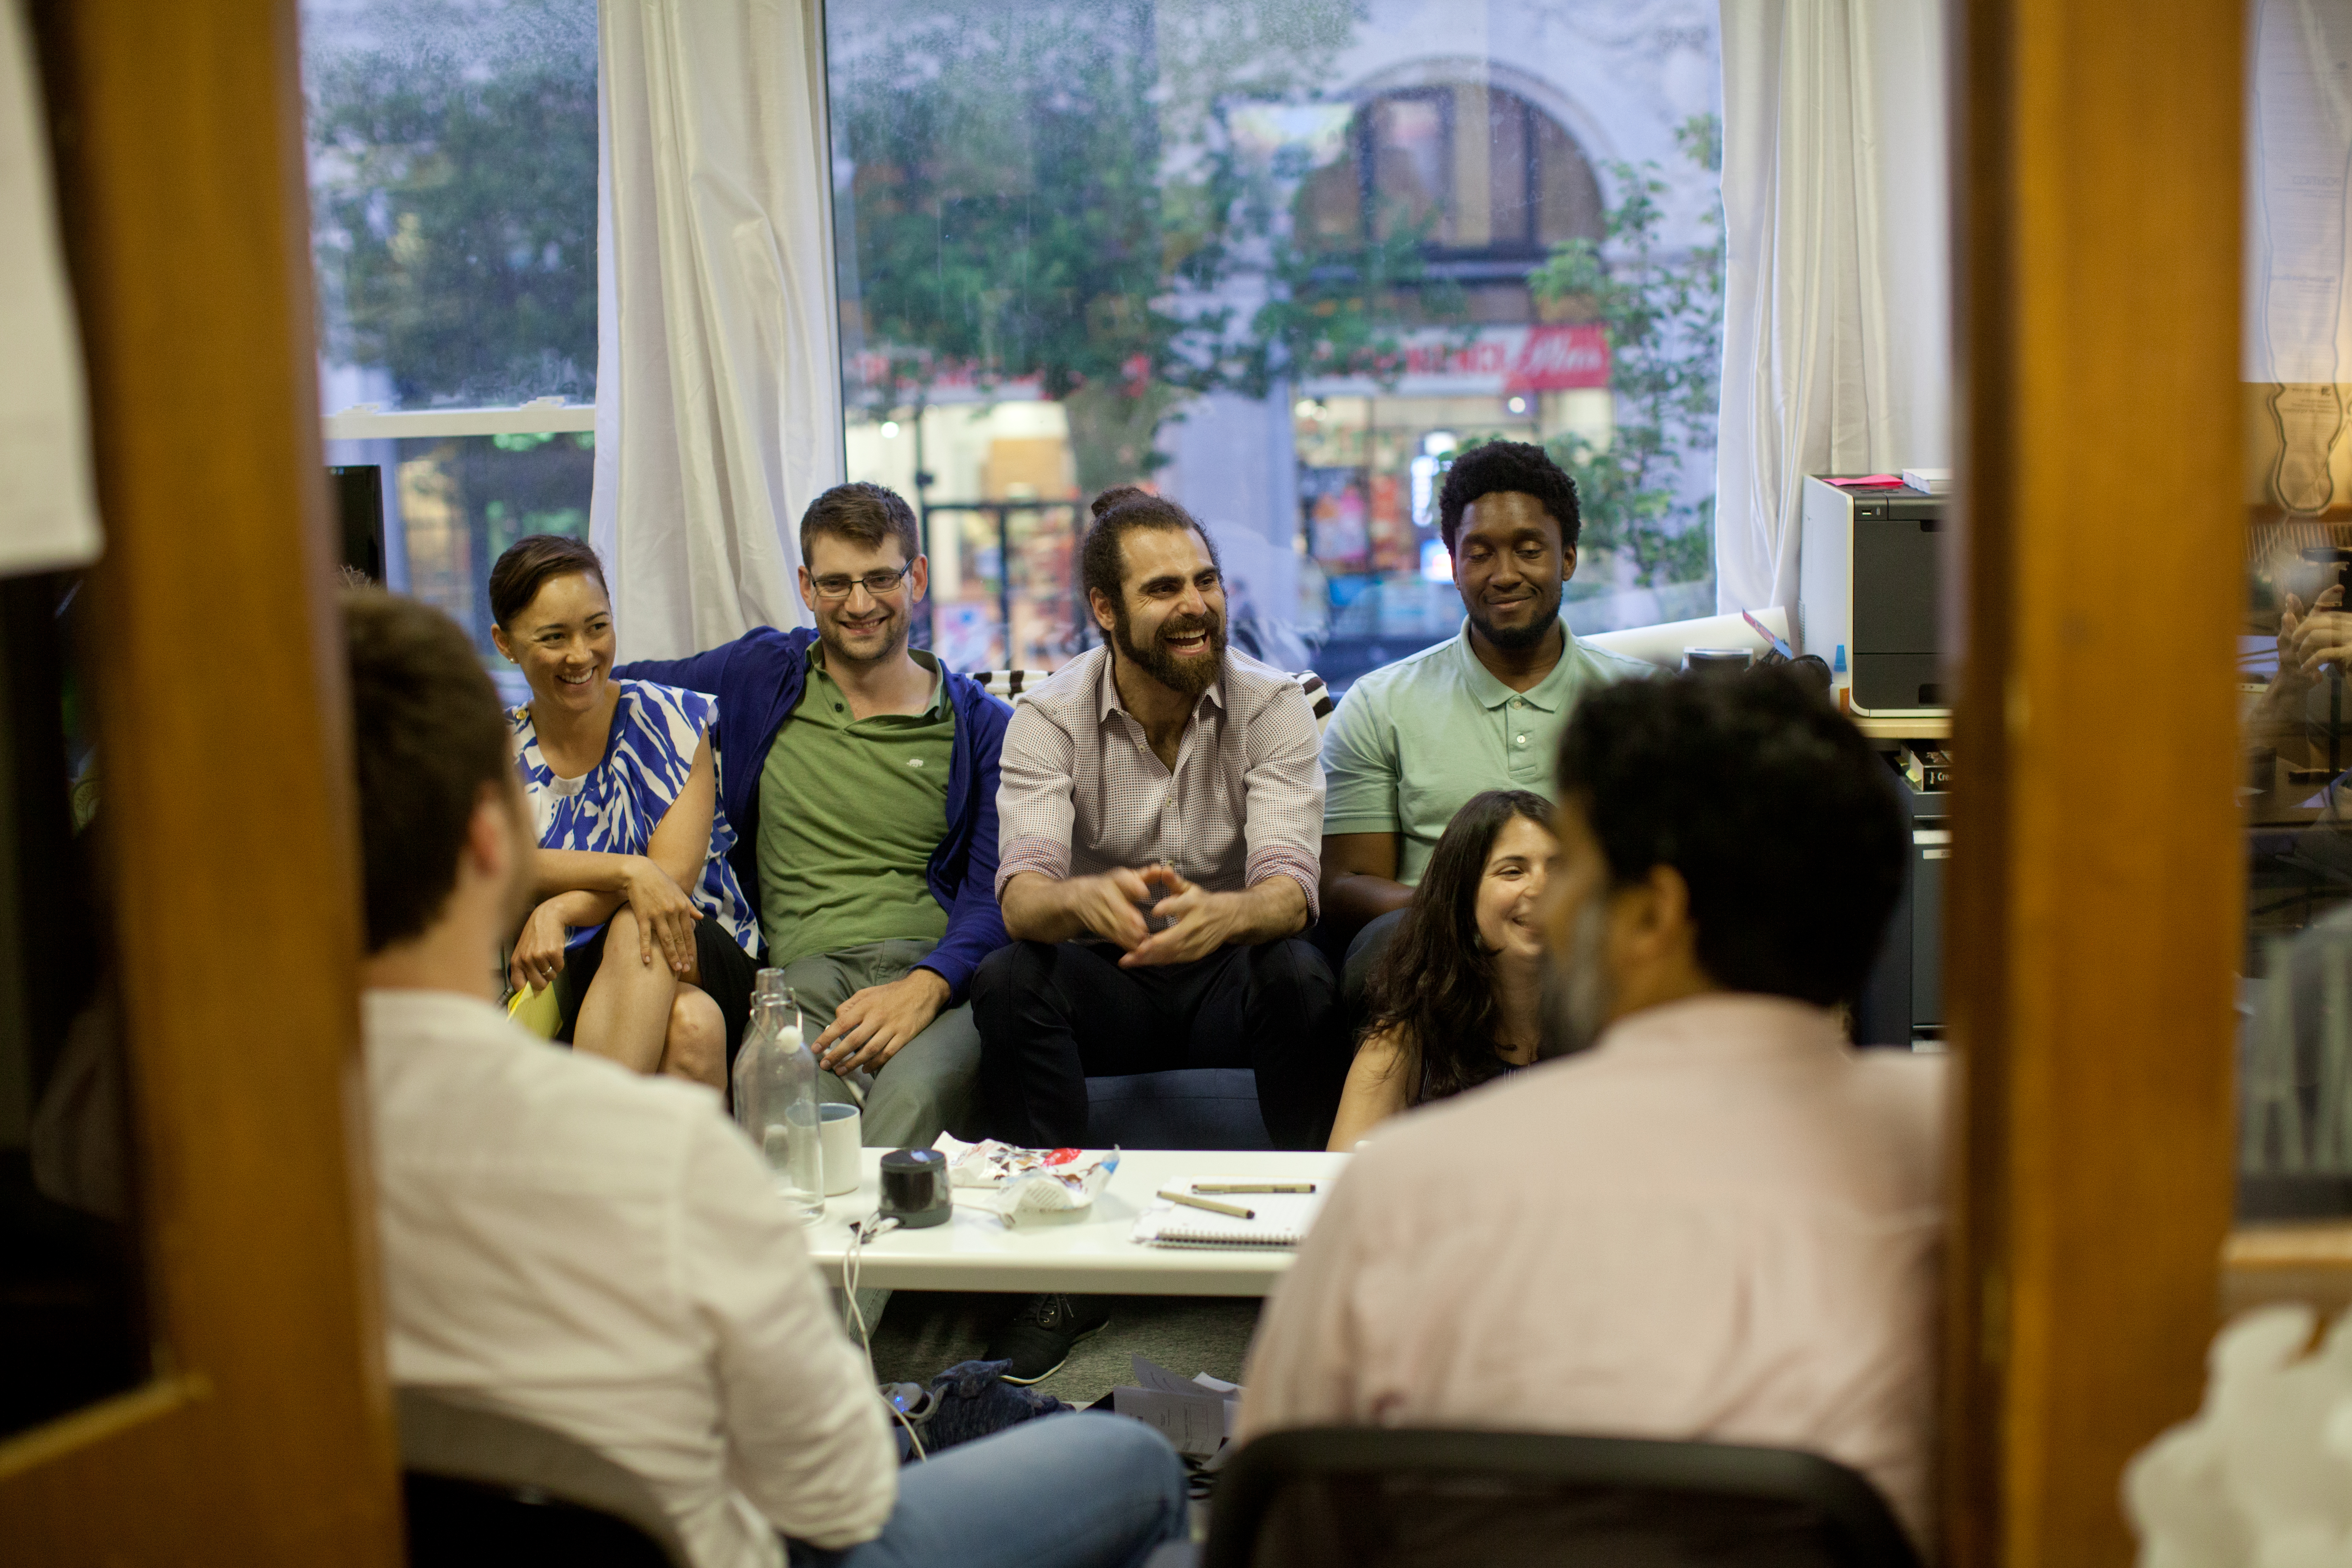 New generation of Muslim leaders emerges in Boston - The Boston Globe